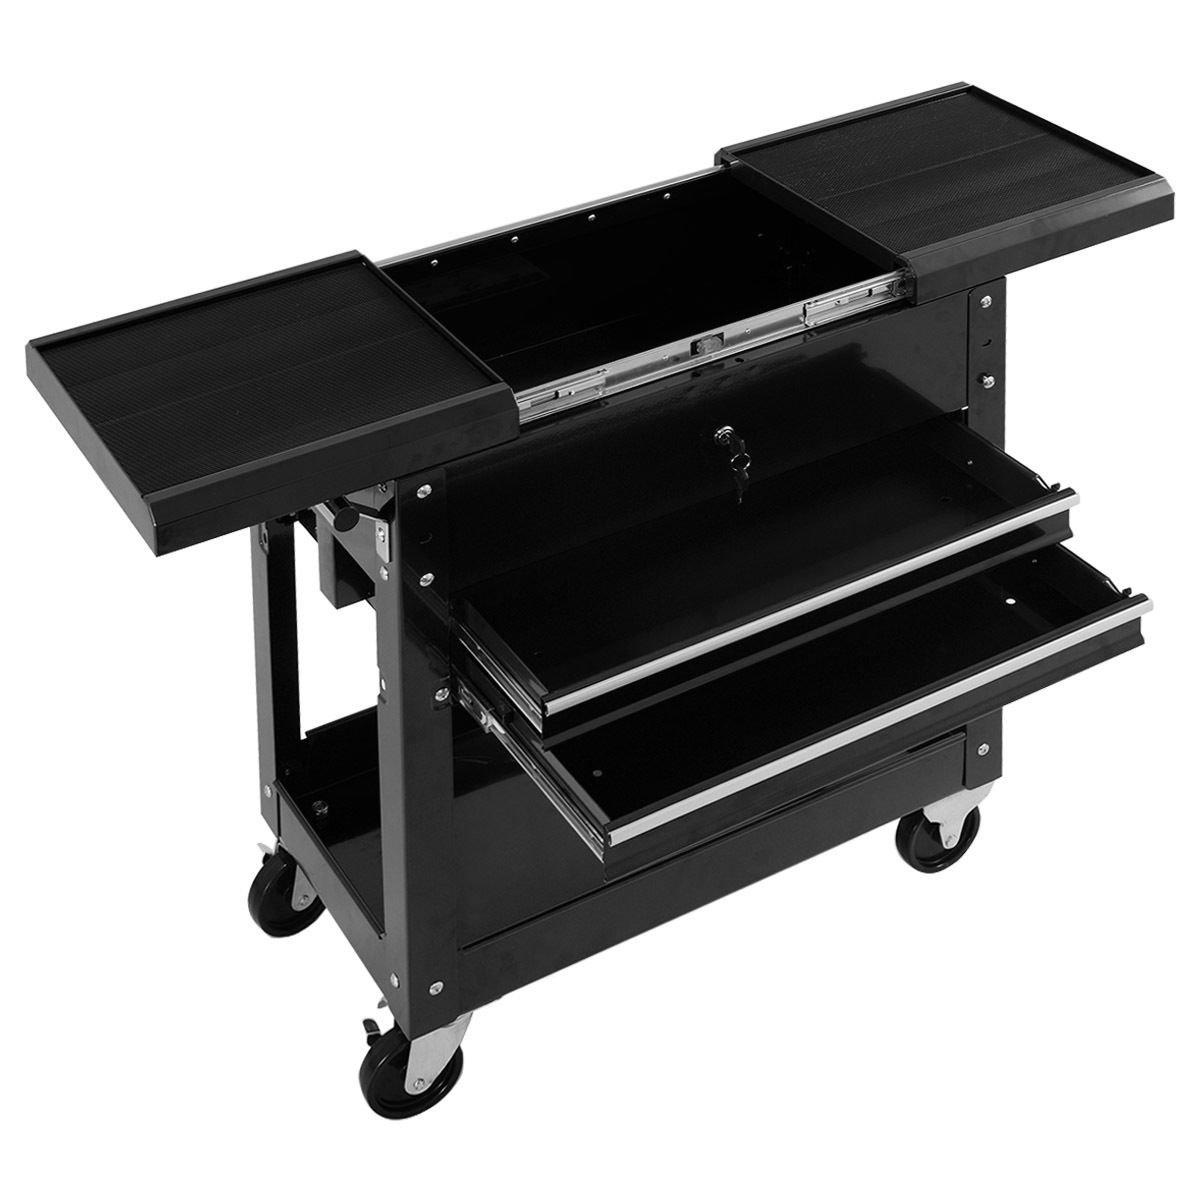 Goplus Rolling Tool Cart Mechanics Slide Top Utility Storage Cabinet Organizer 2 Drawer